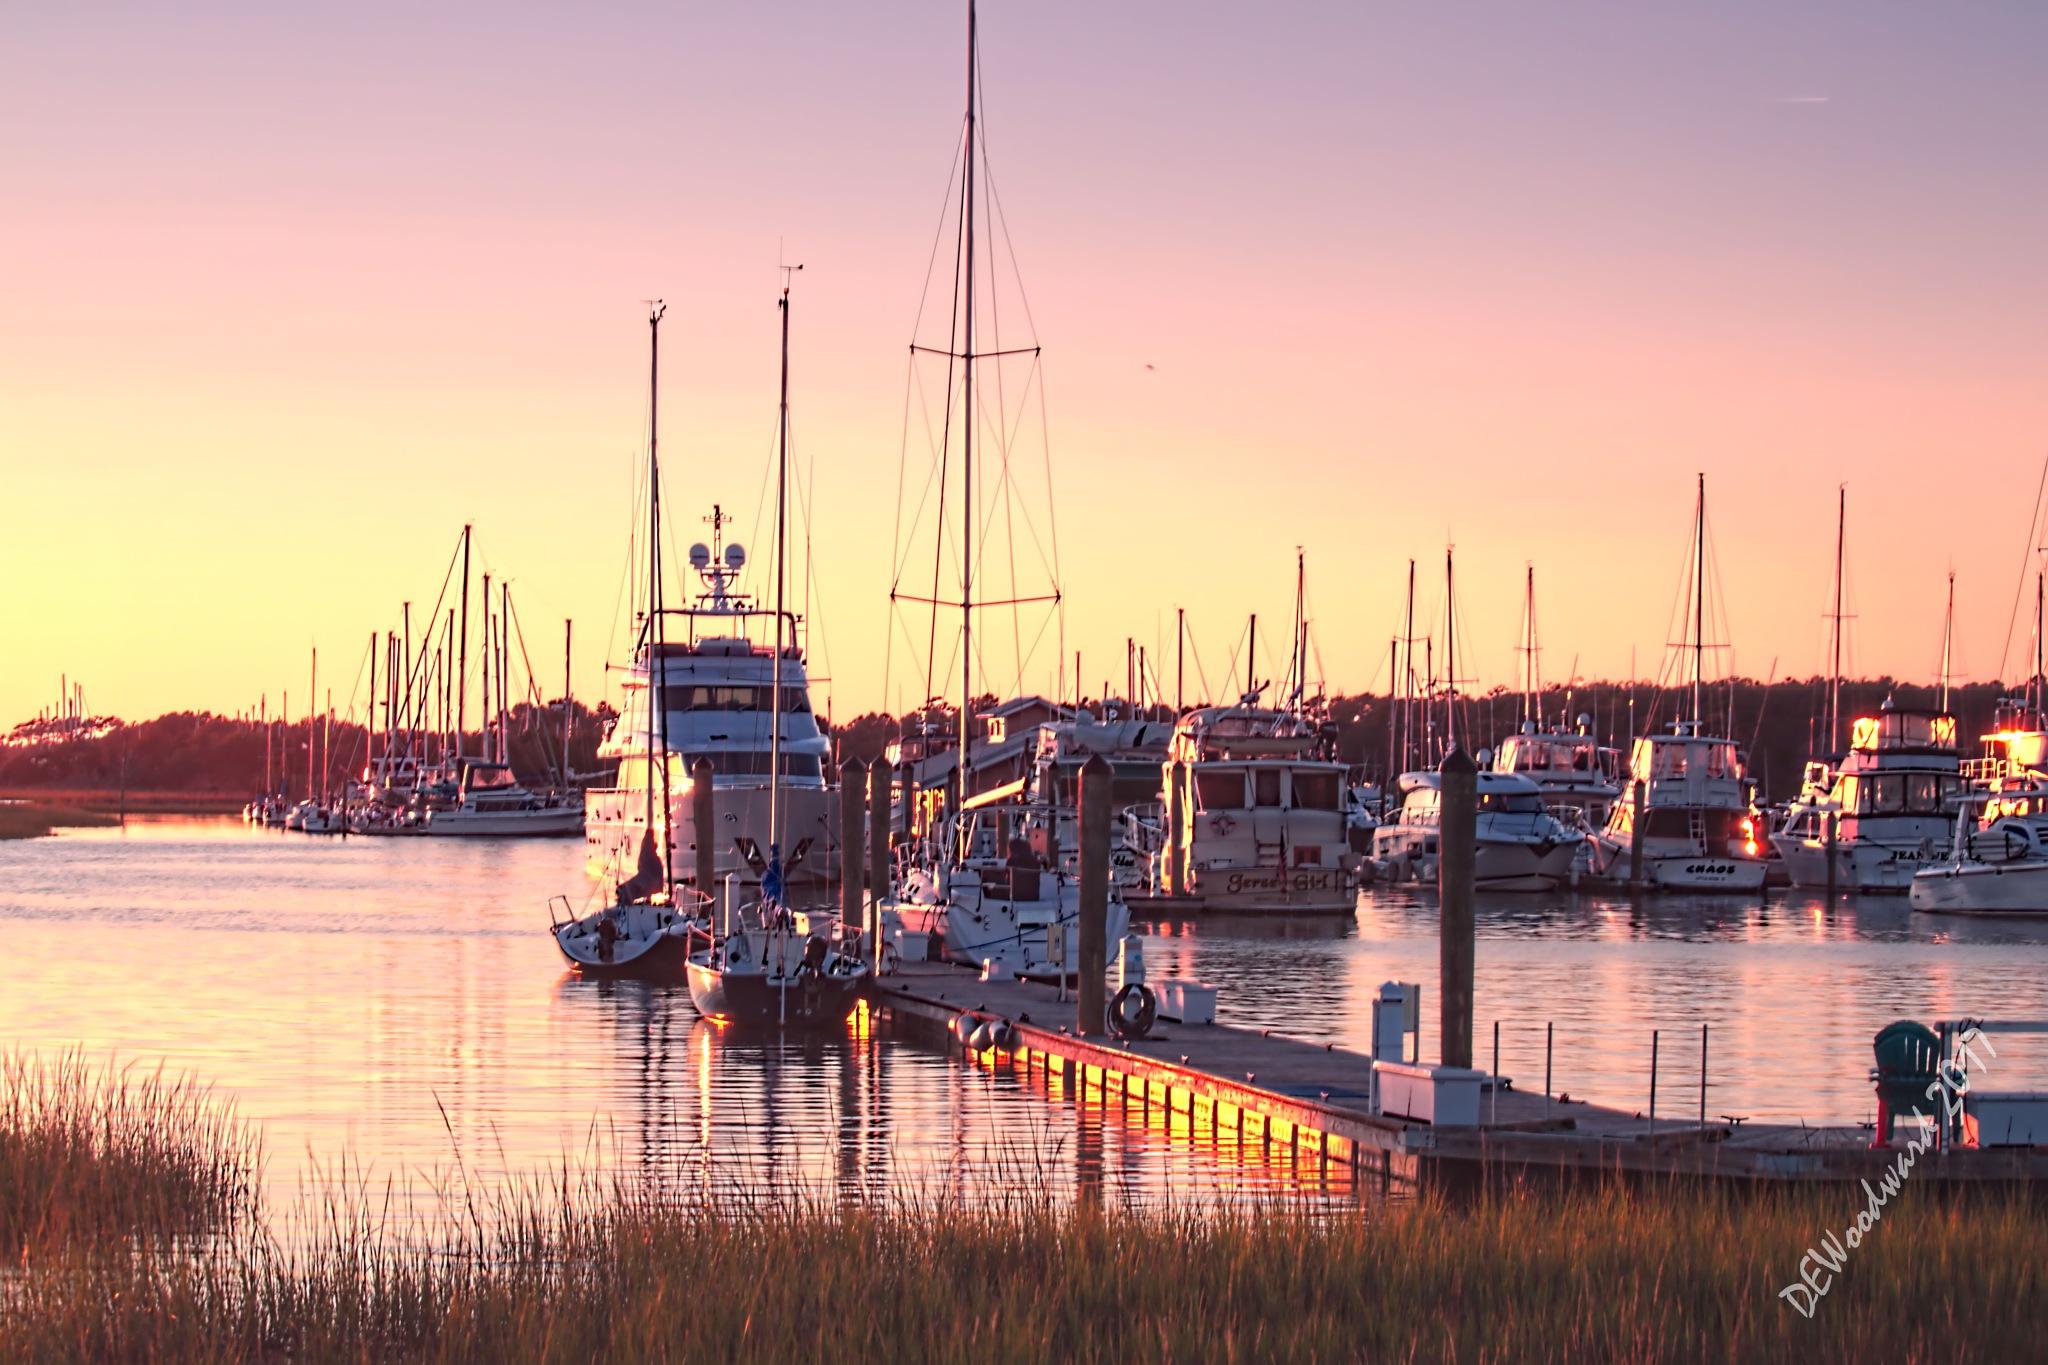 Southport Marina by dewoodward